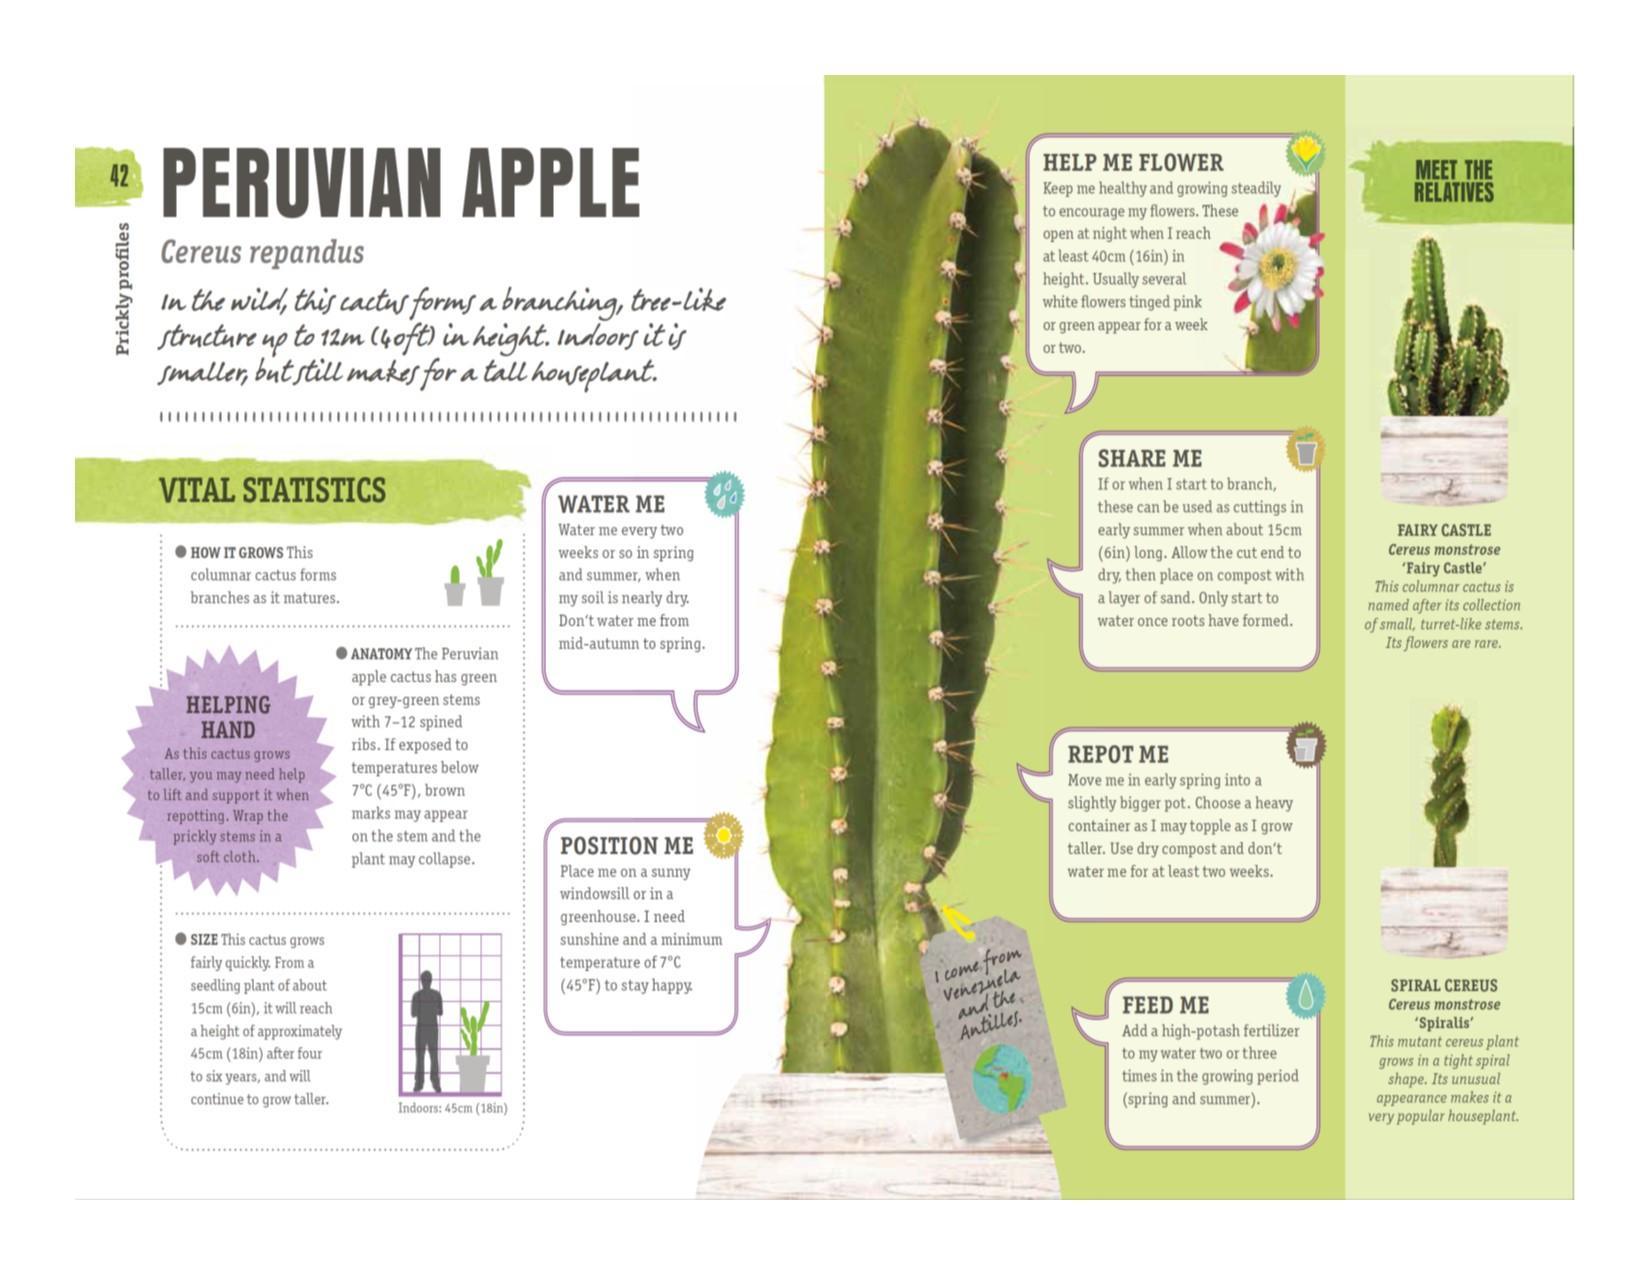 Happy Cactus: Cacti, Succulents, and More: DK: 9781465474537: Amazon ...